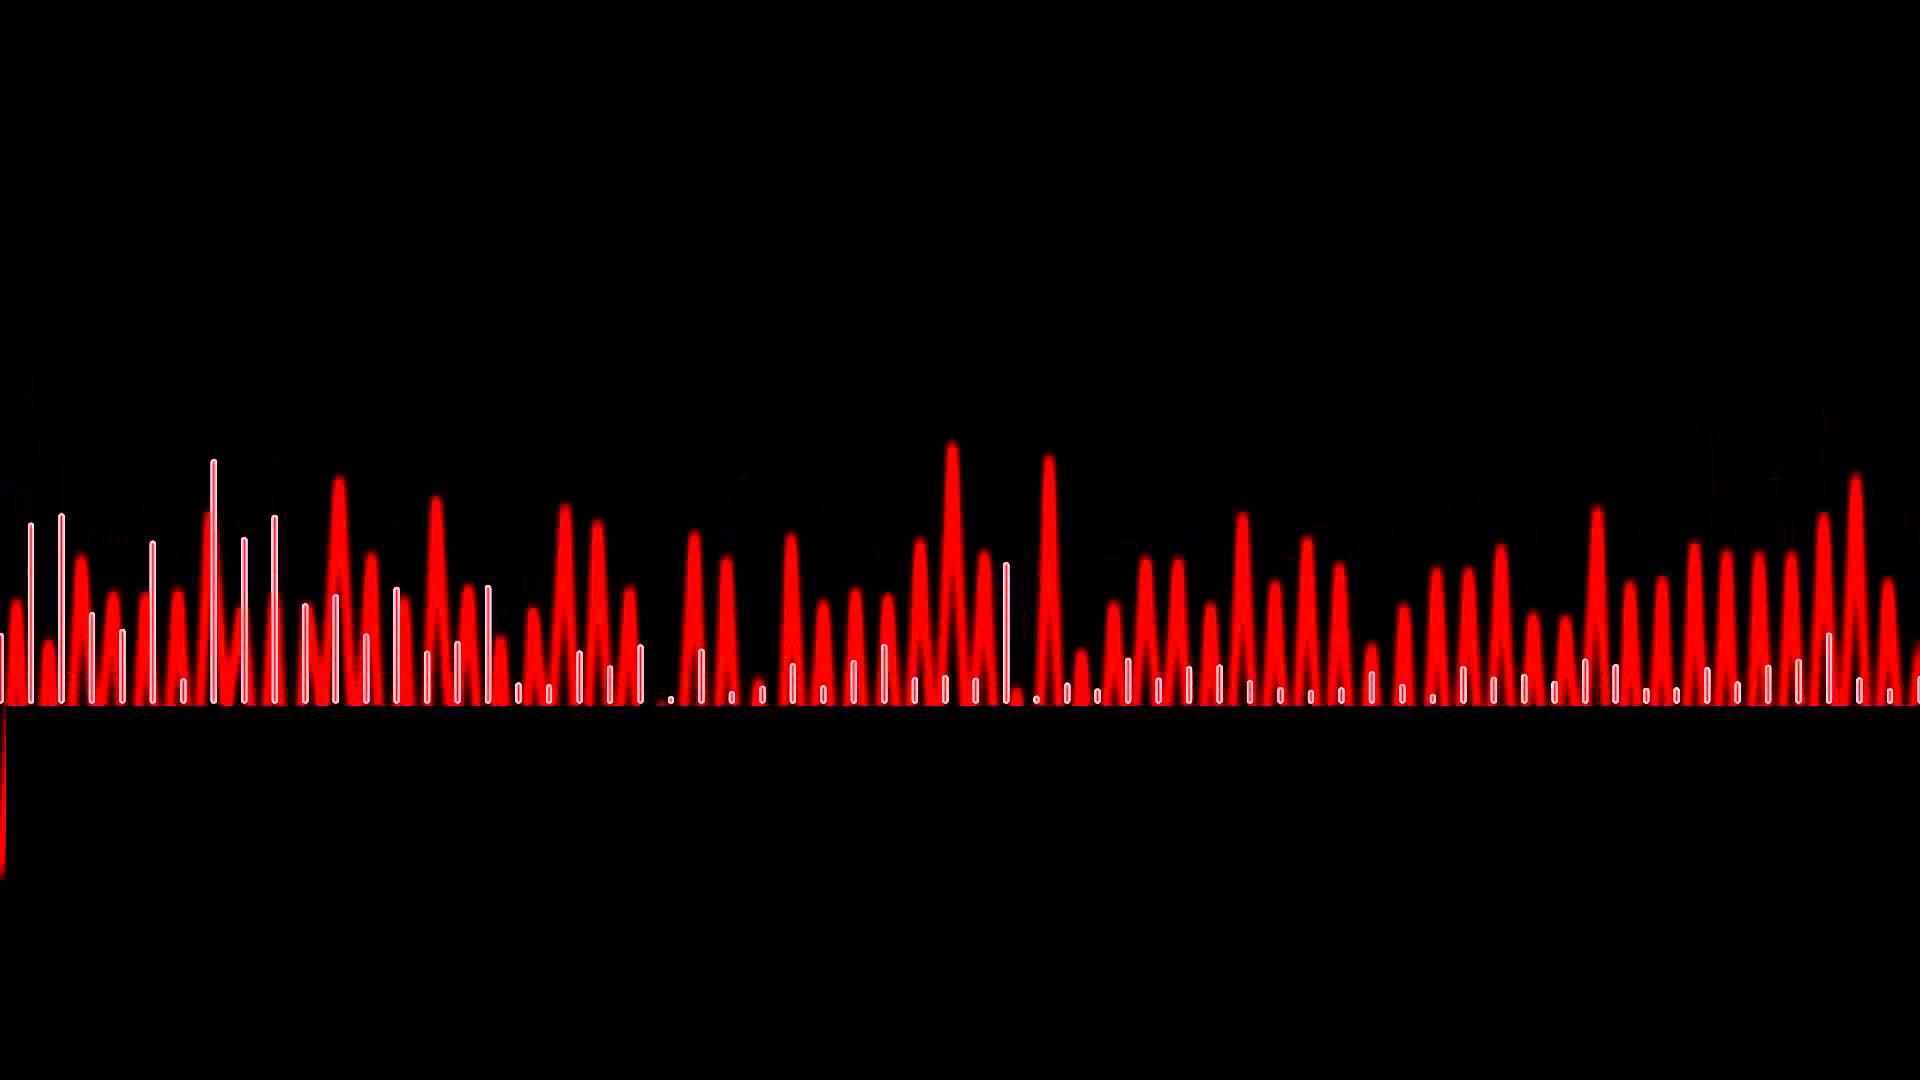 SoundCloud Wallpapers - Top Free SoundCloud Backgrounds